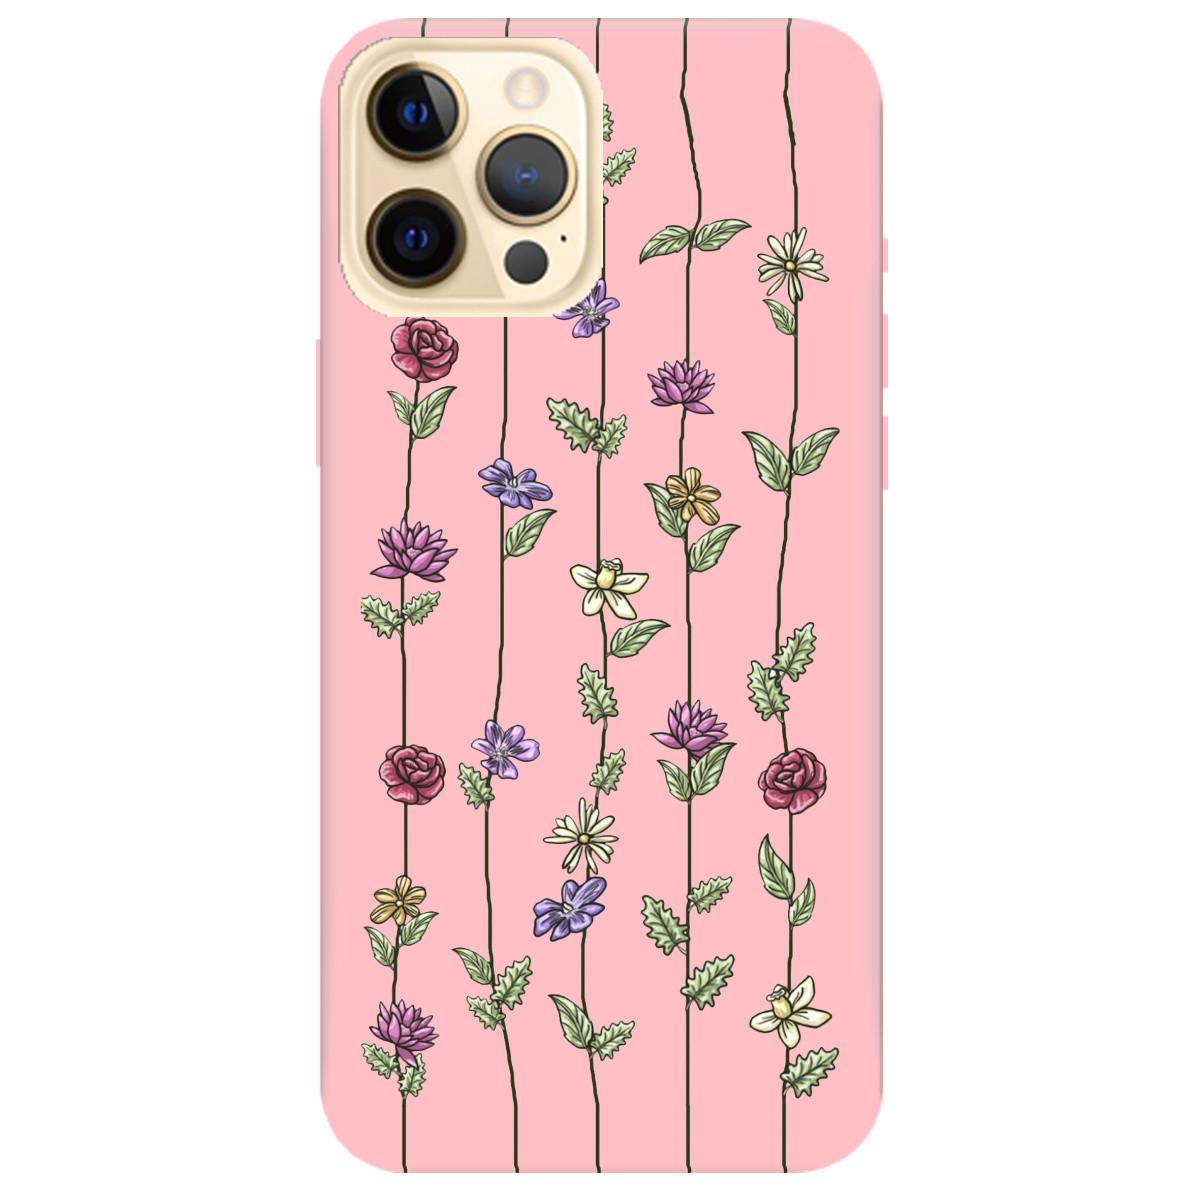 Чехол для Apple iPhone 12 Pro нежно-розовый матовый soft touch Vines